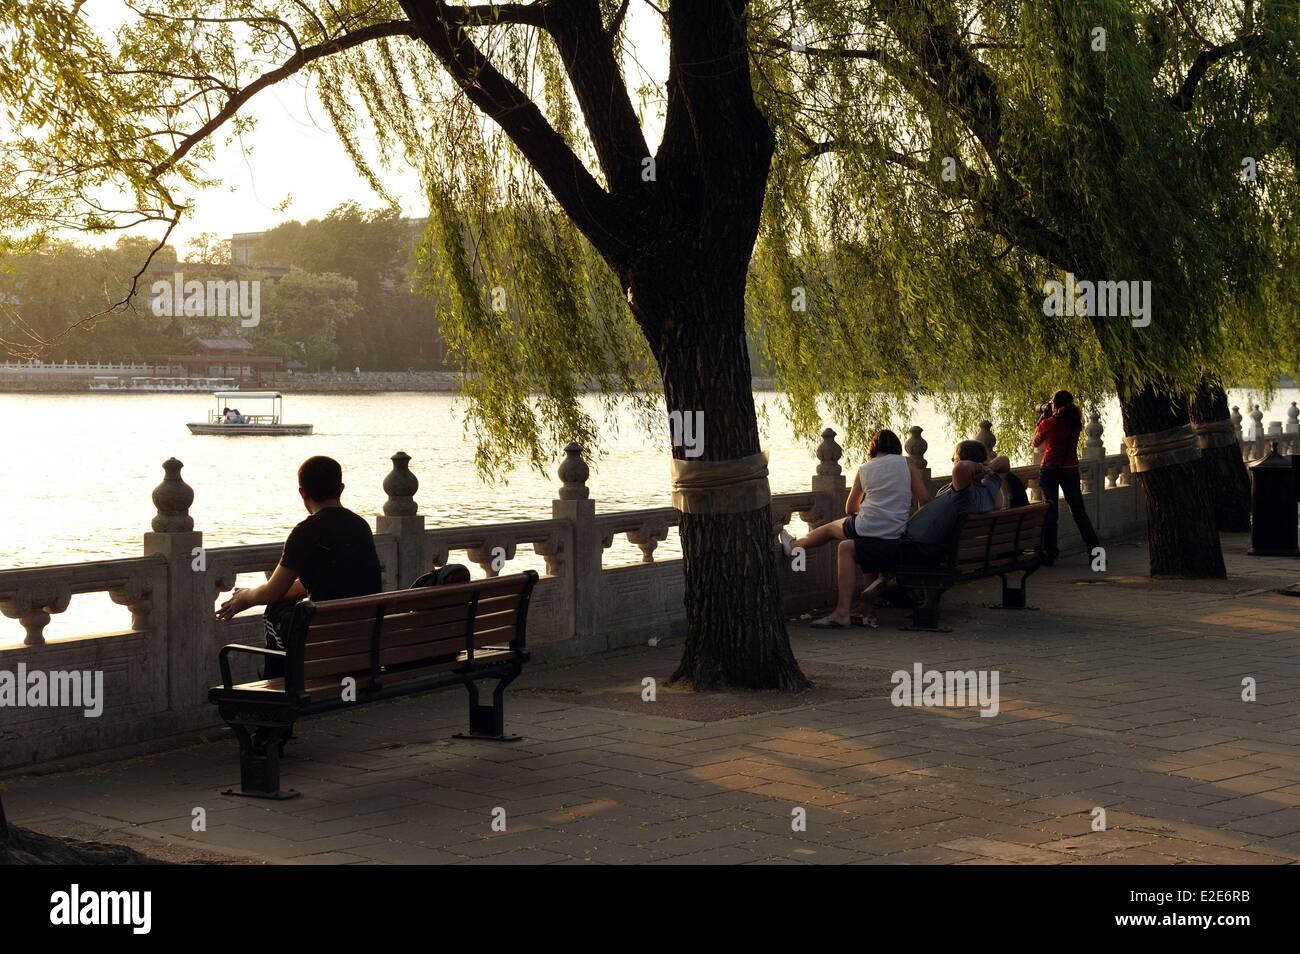 China, Beijing, Inner City, Qiong hua Island in the Beihai parc - Stock Image